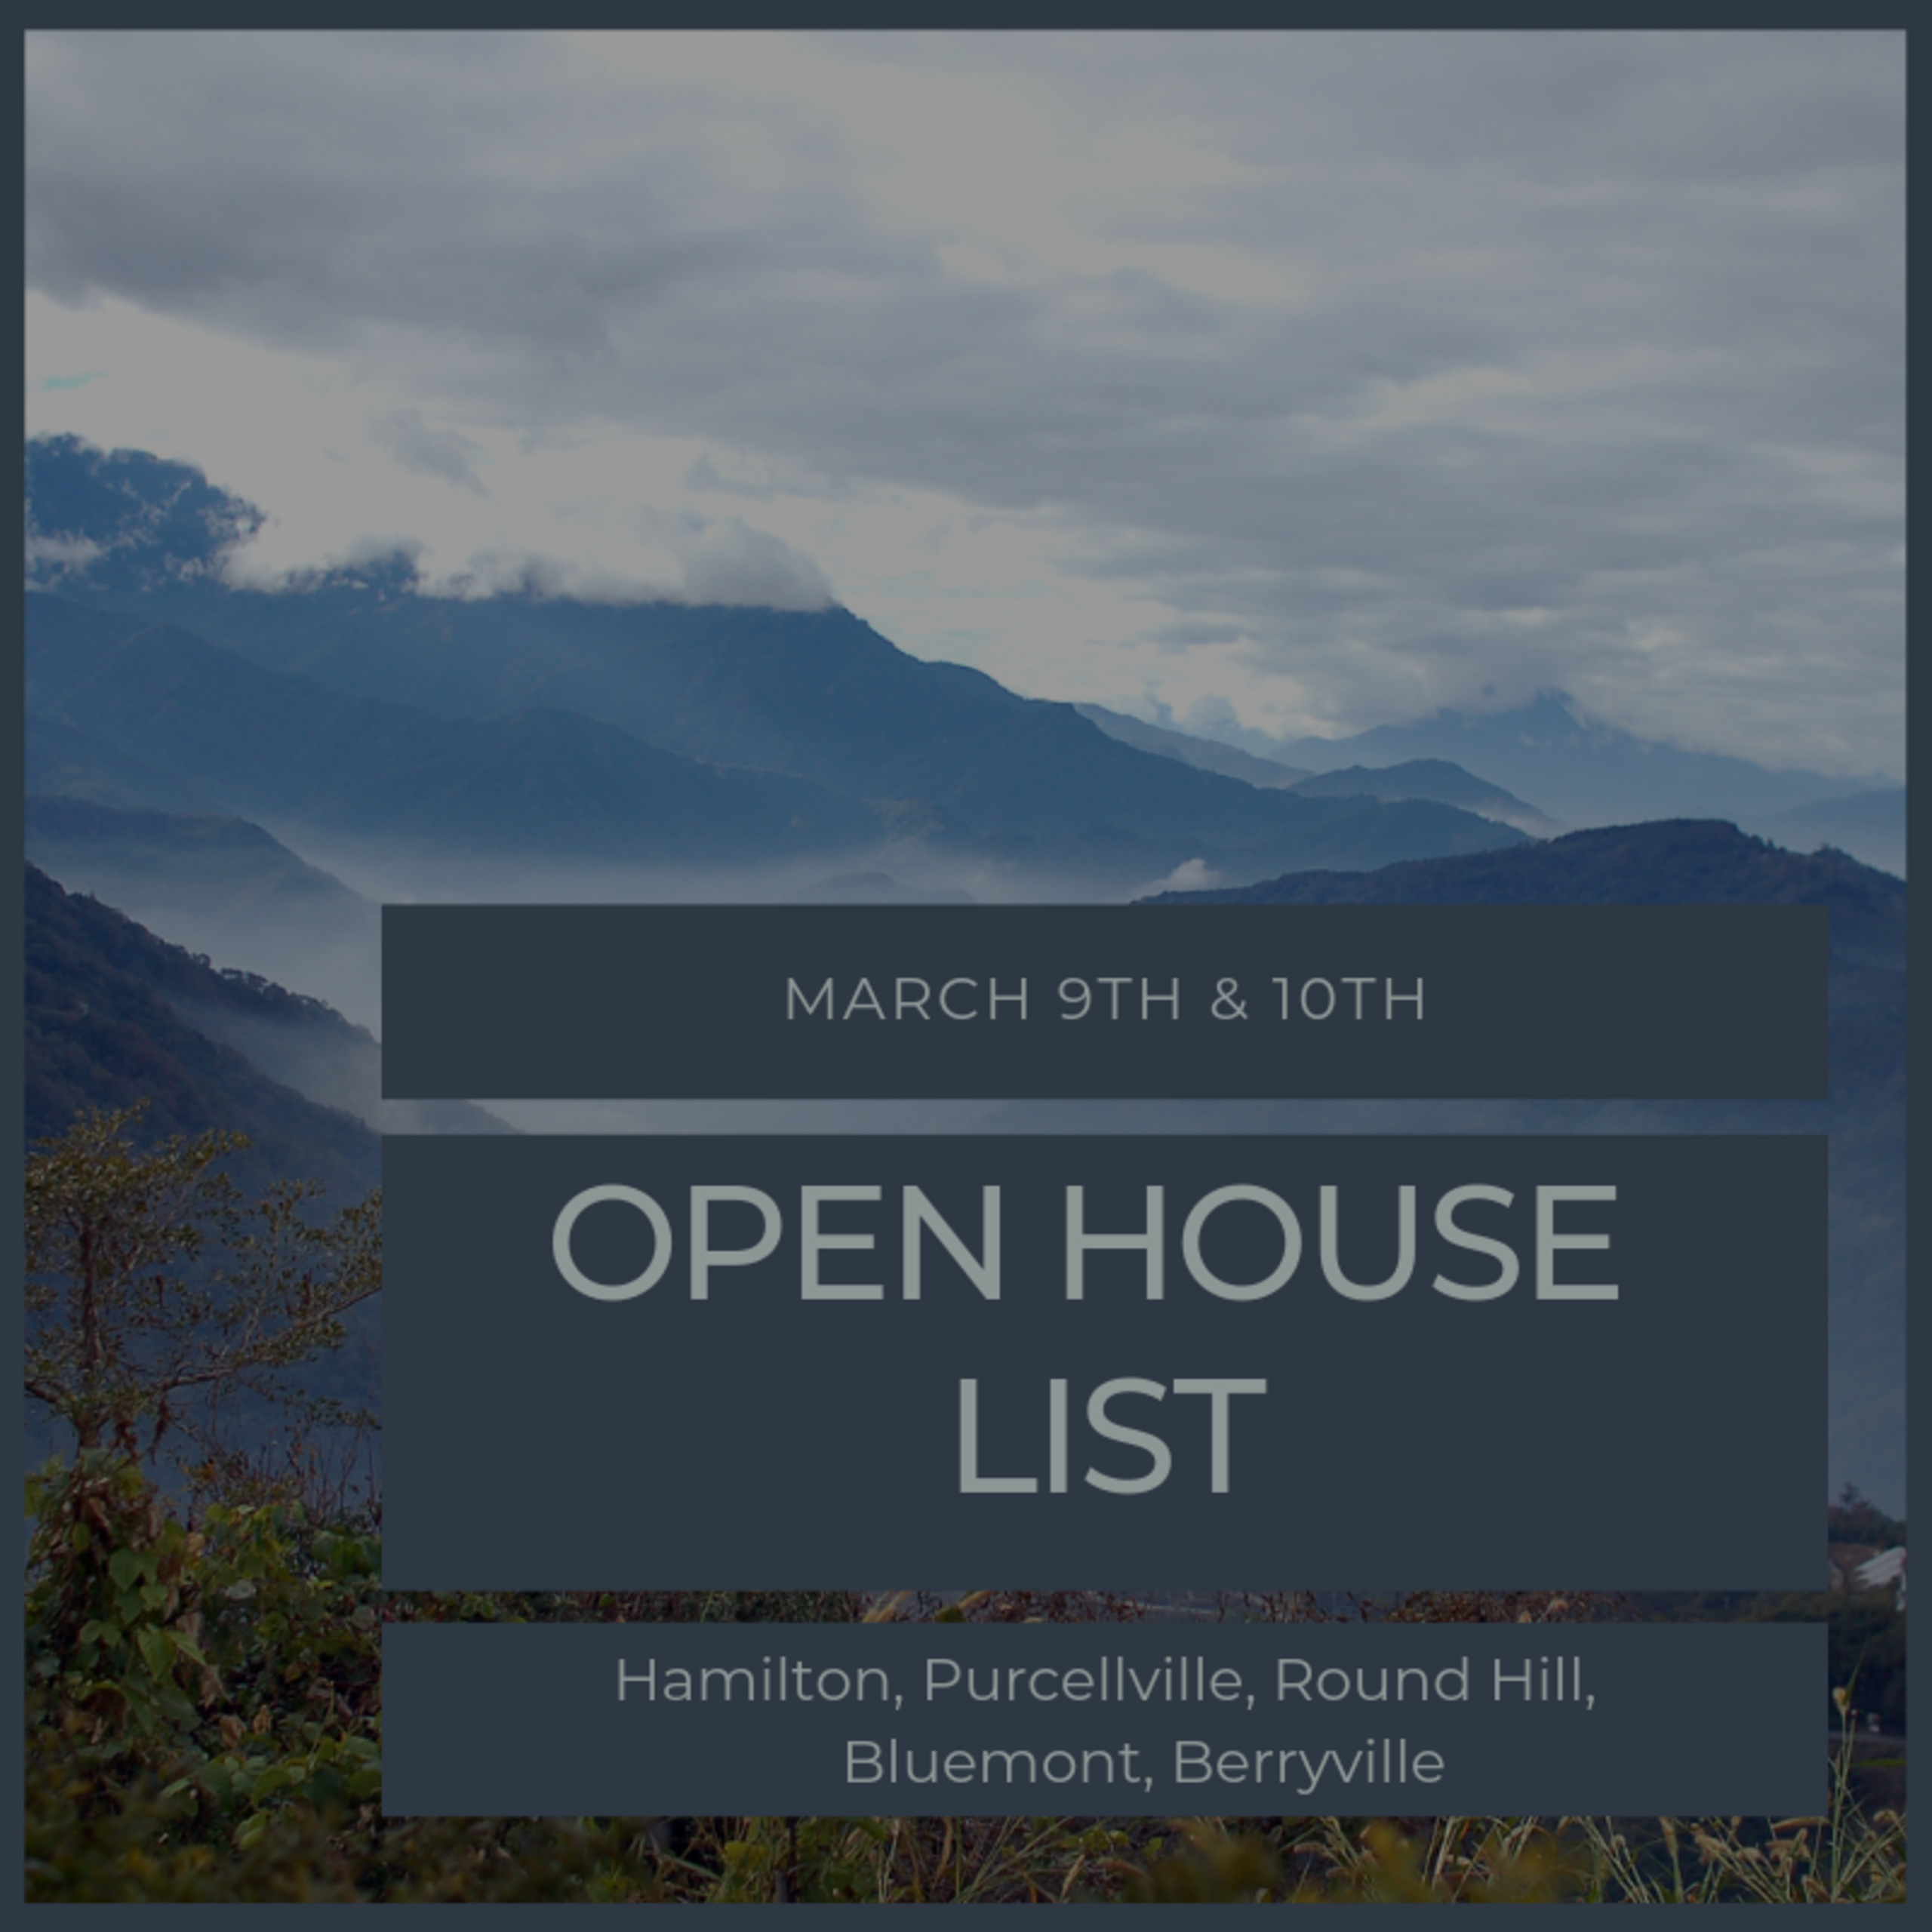 Open House List 3/9/19 – 3/10/19